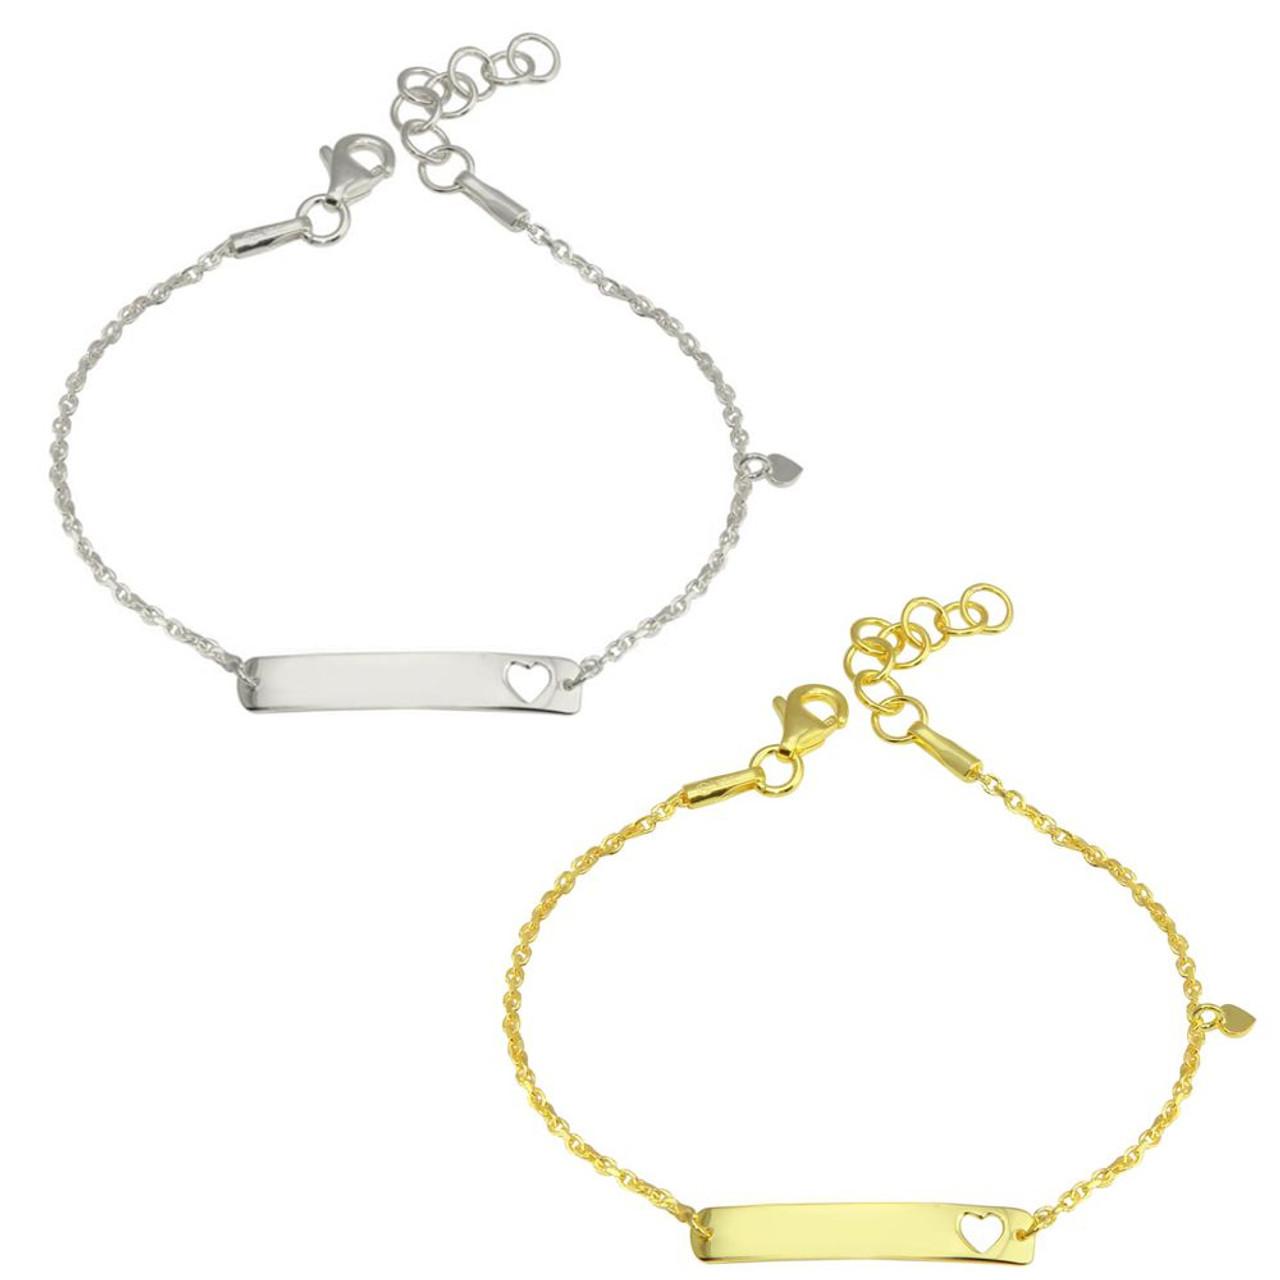 925 Sterling Silver Adjustable Child/'s Baby/'s Christening ID Plate Bracelet